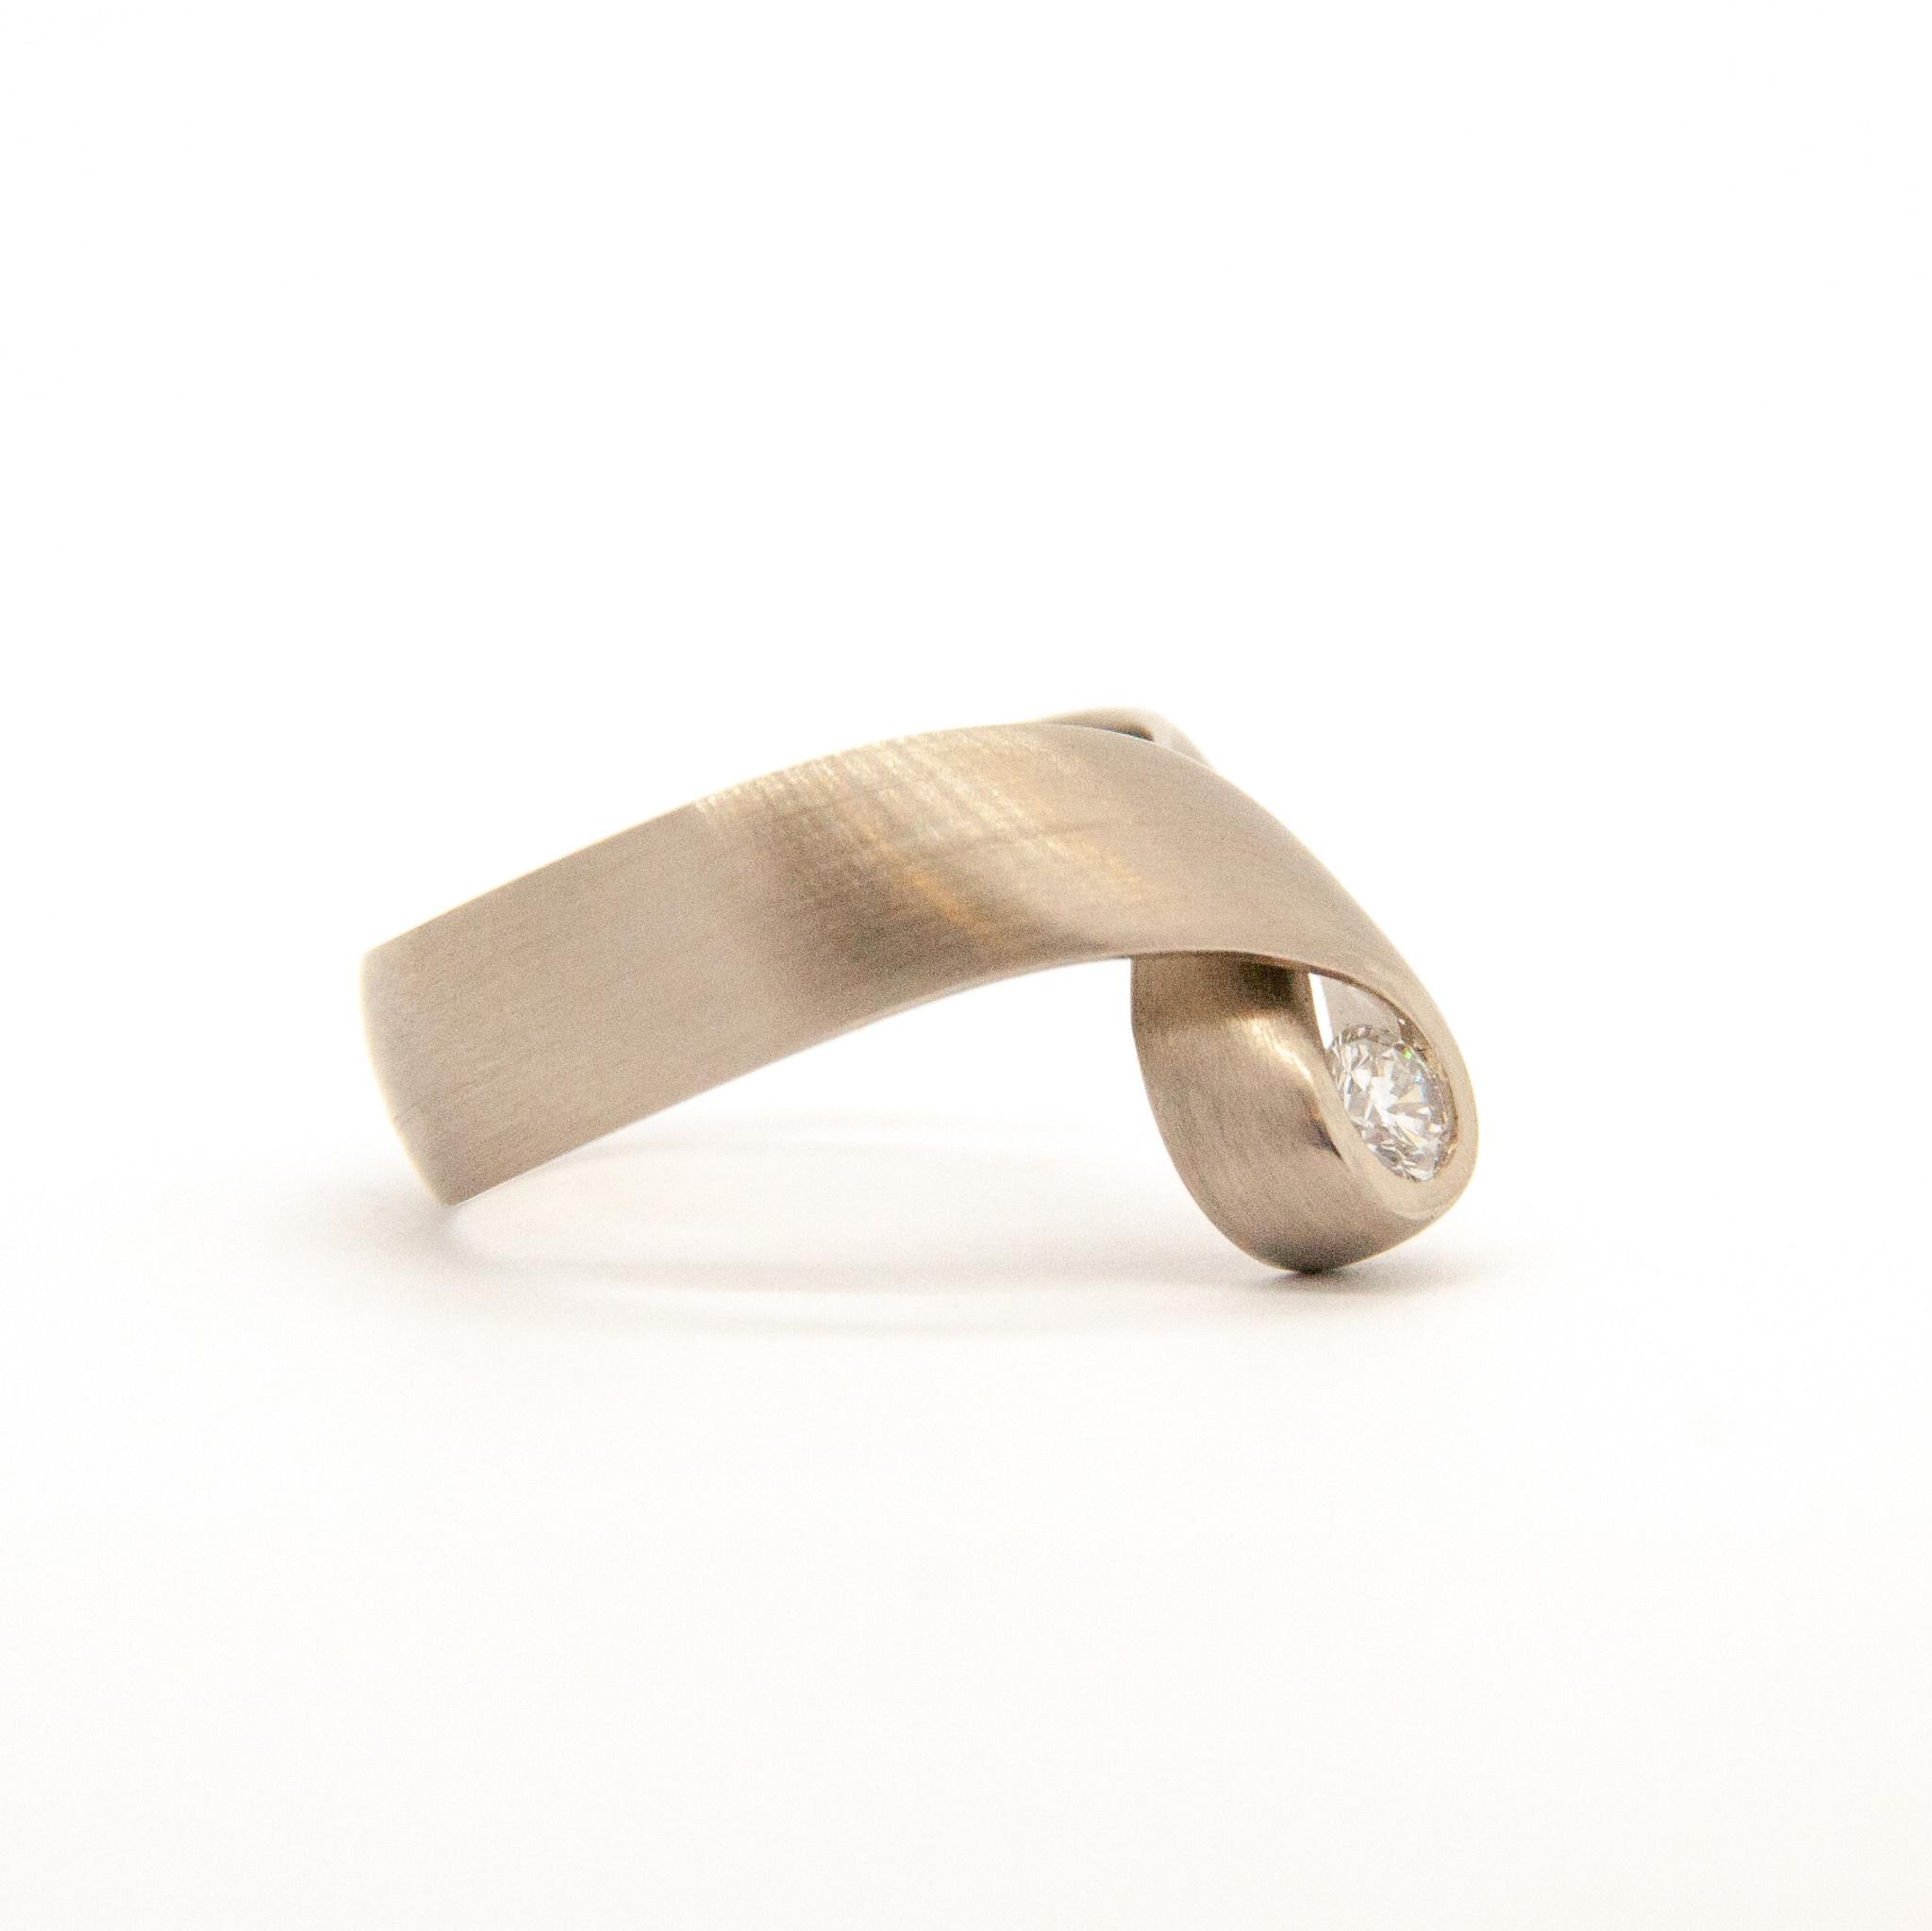 14k white gold ring size 56-8